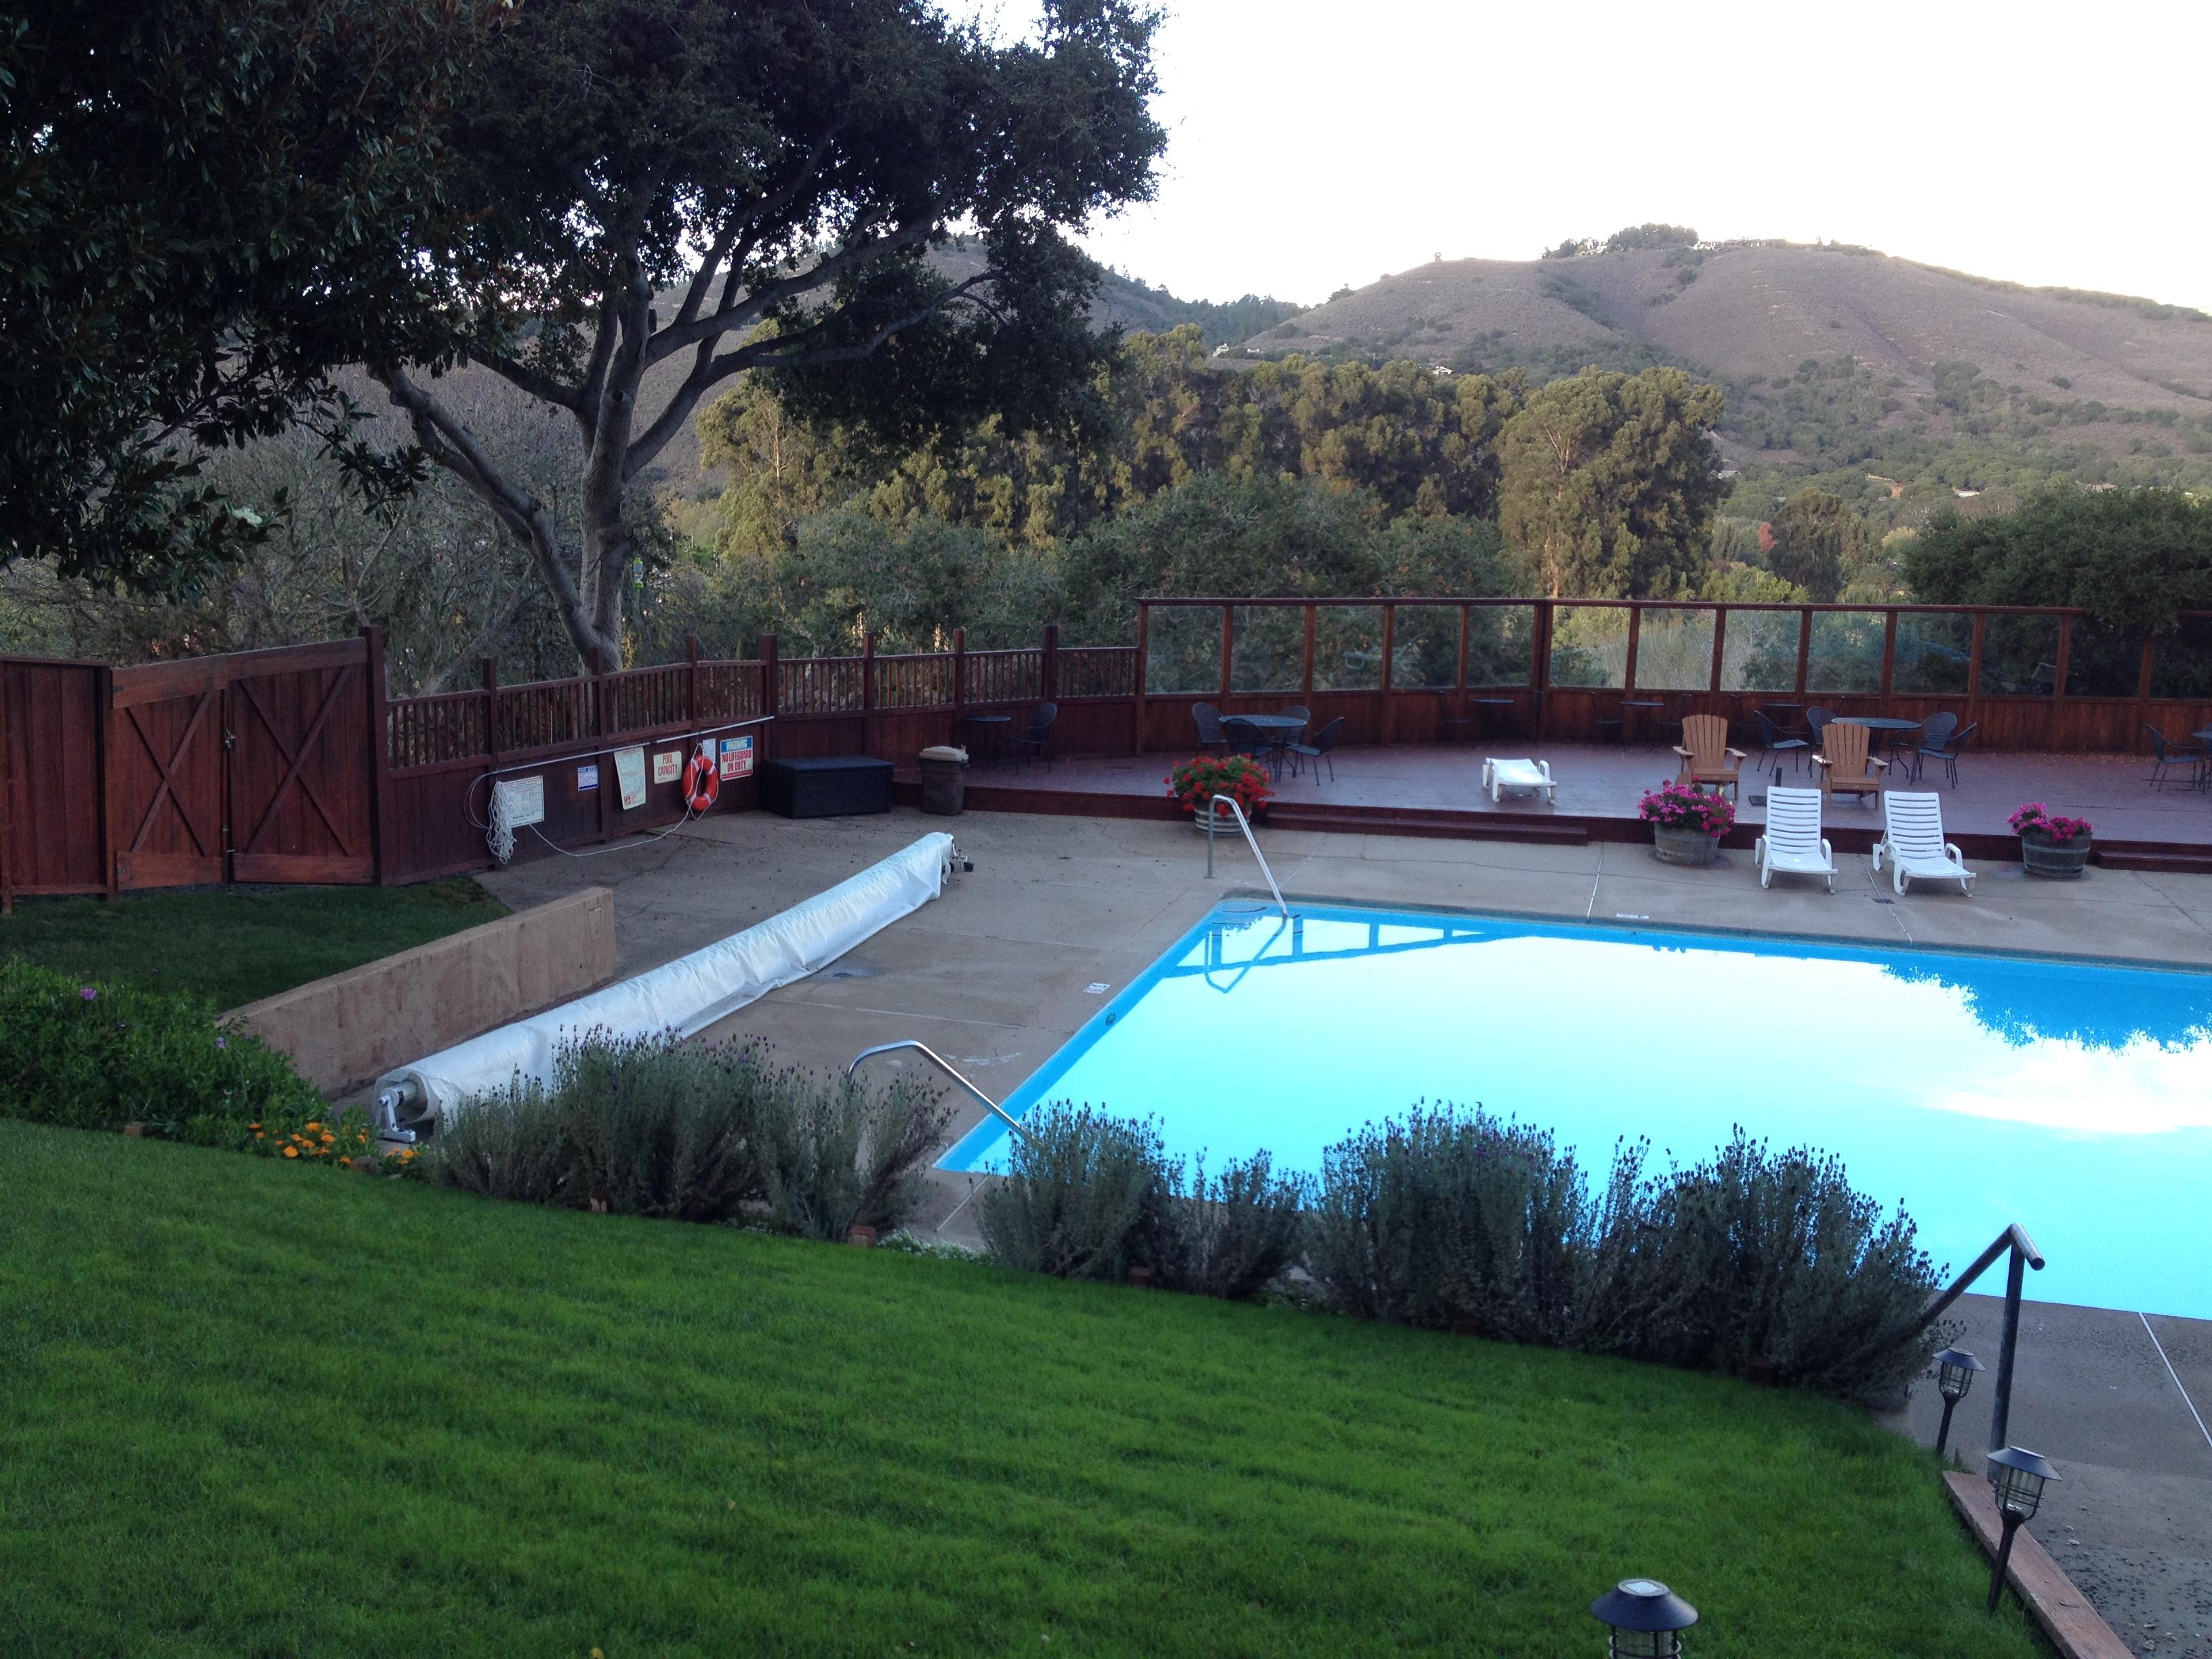 Saddle Mountain RV Park & Campground, Carmel, CA ...